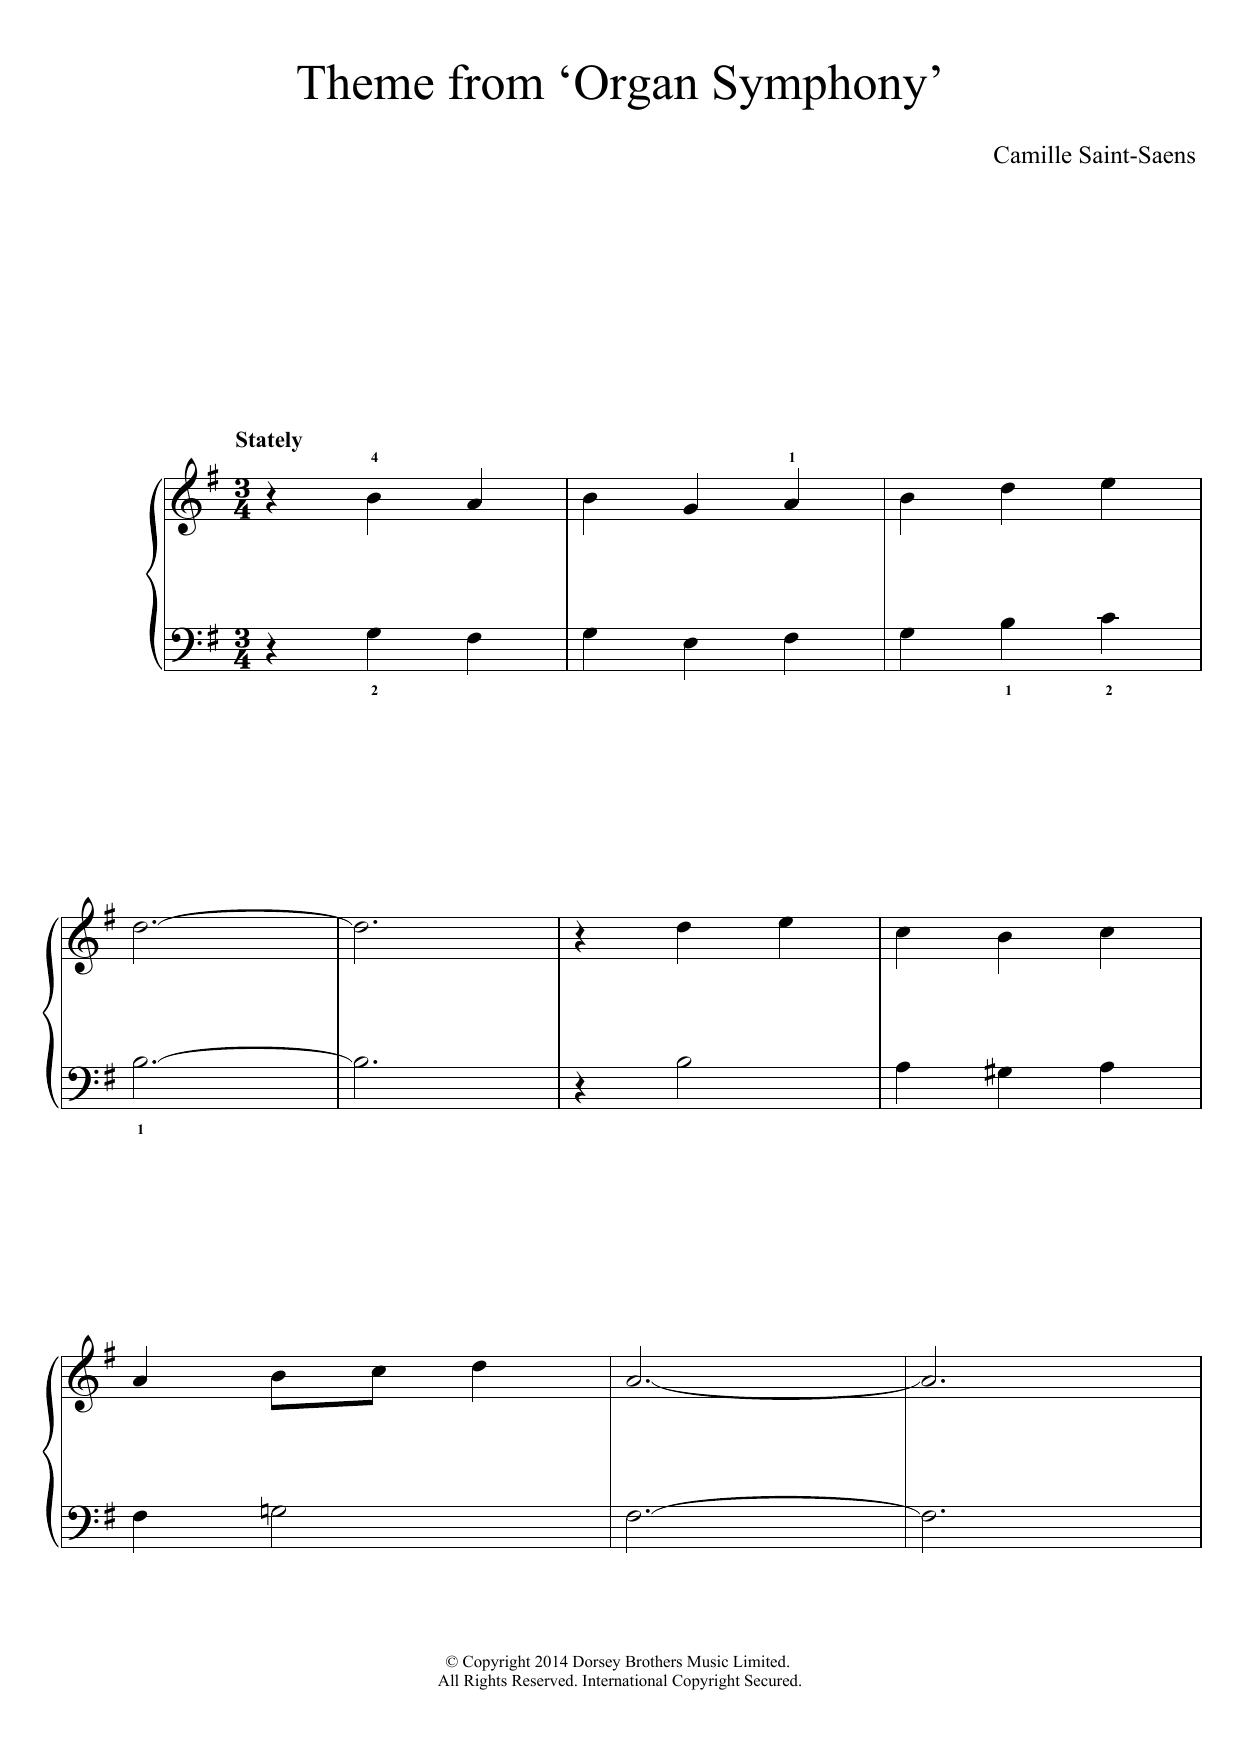 Camille Saint-Saens - 'Organ' Symphony (Theme)